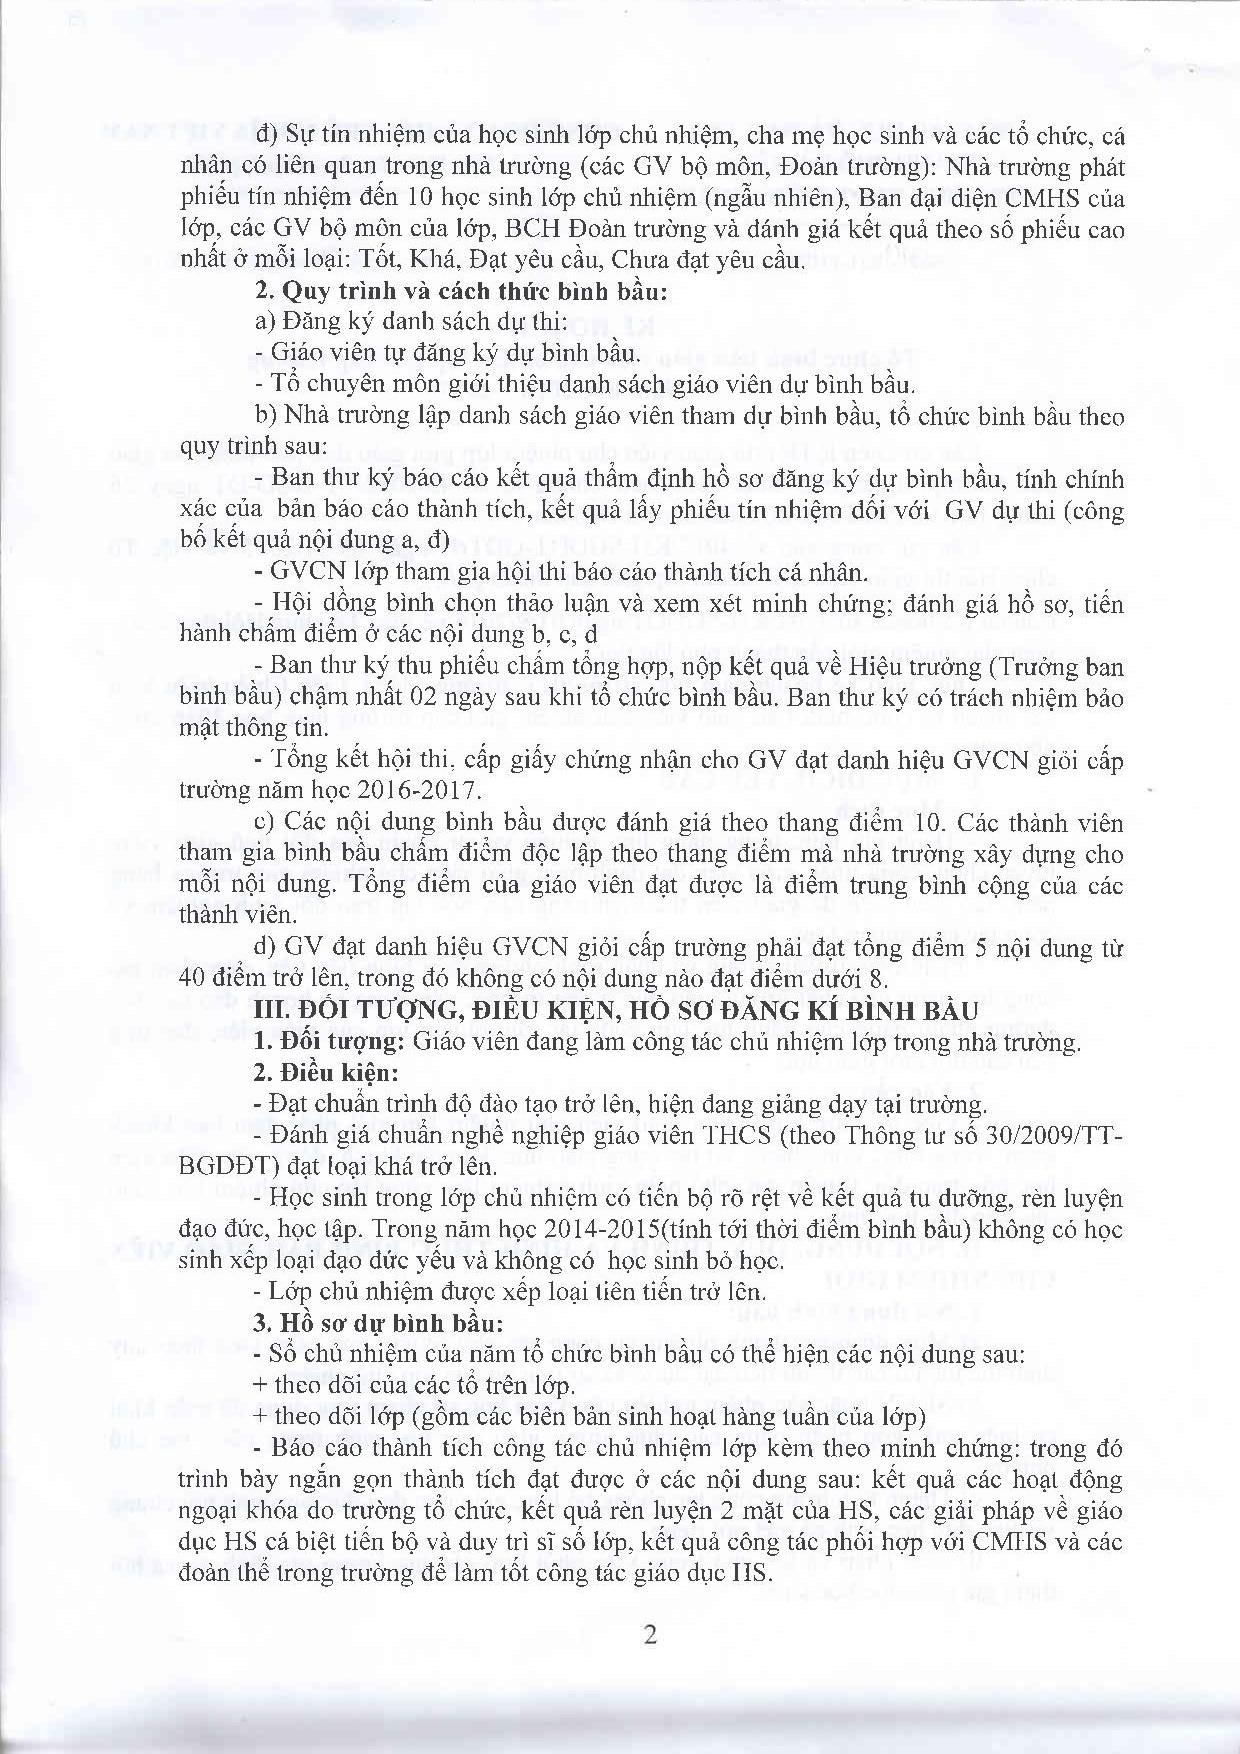 KE HOACH TO CHUC BINH BAU GVCN GIOI CAP TRUONG NAM HOC 2016-2017-page-002